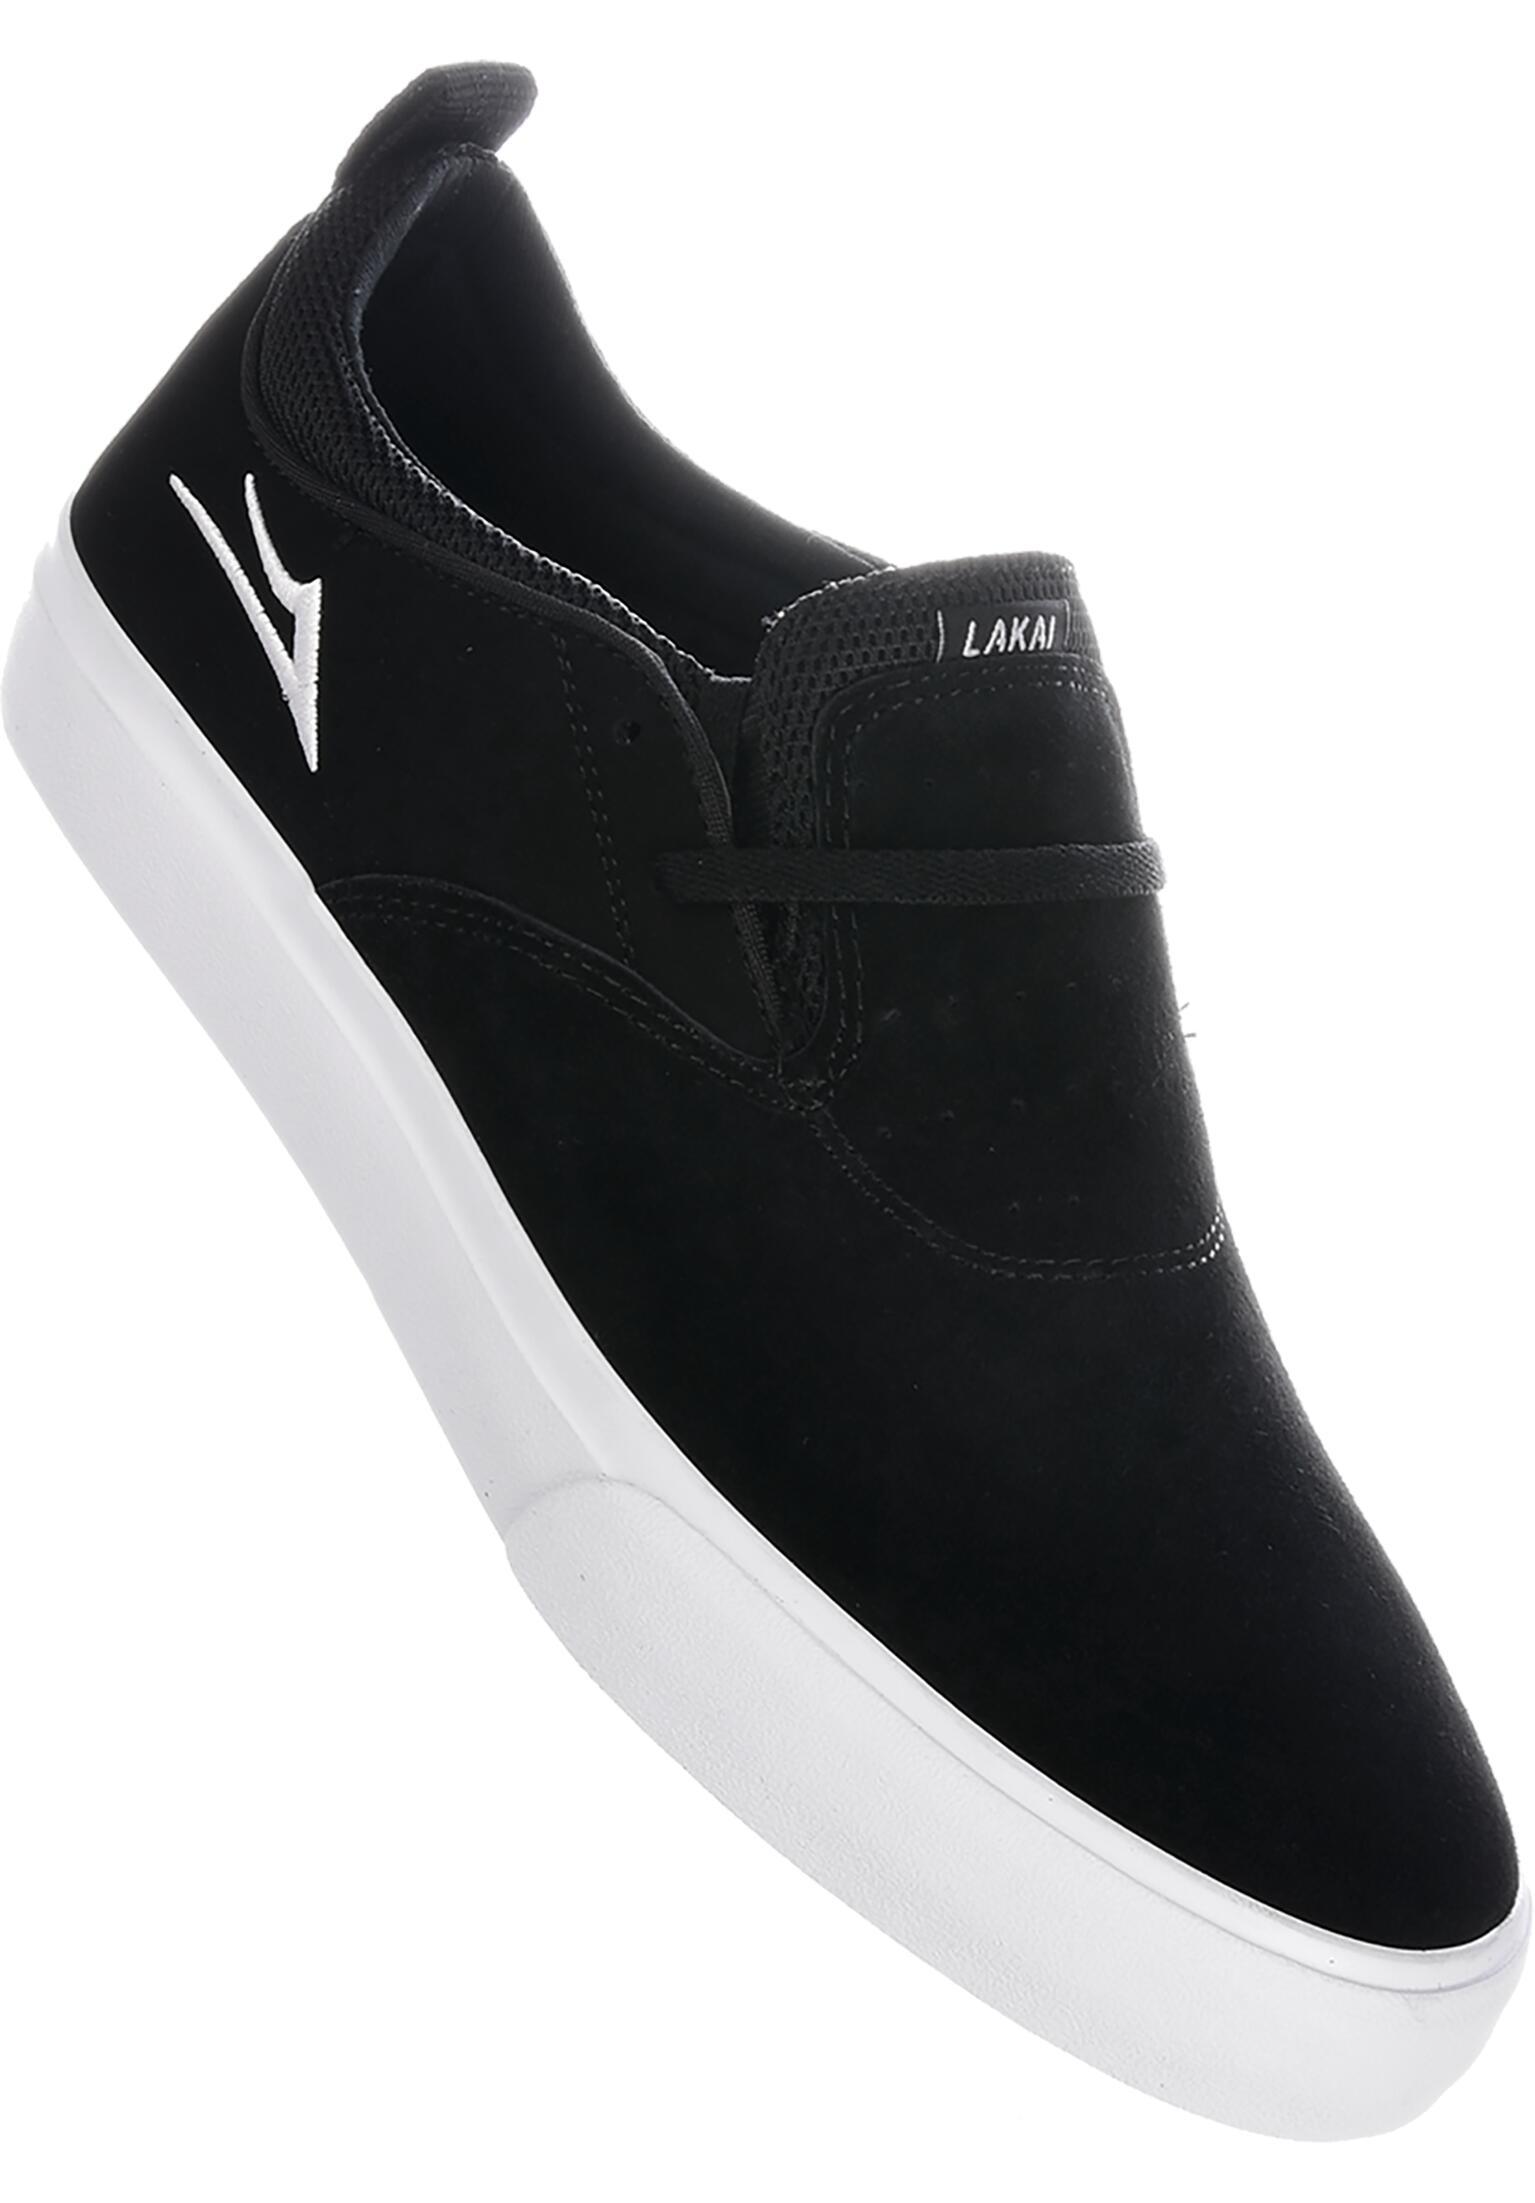 16301b6574d8 Riley 2 Lakai All Shoes in black-white for Men | Titus